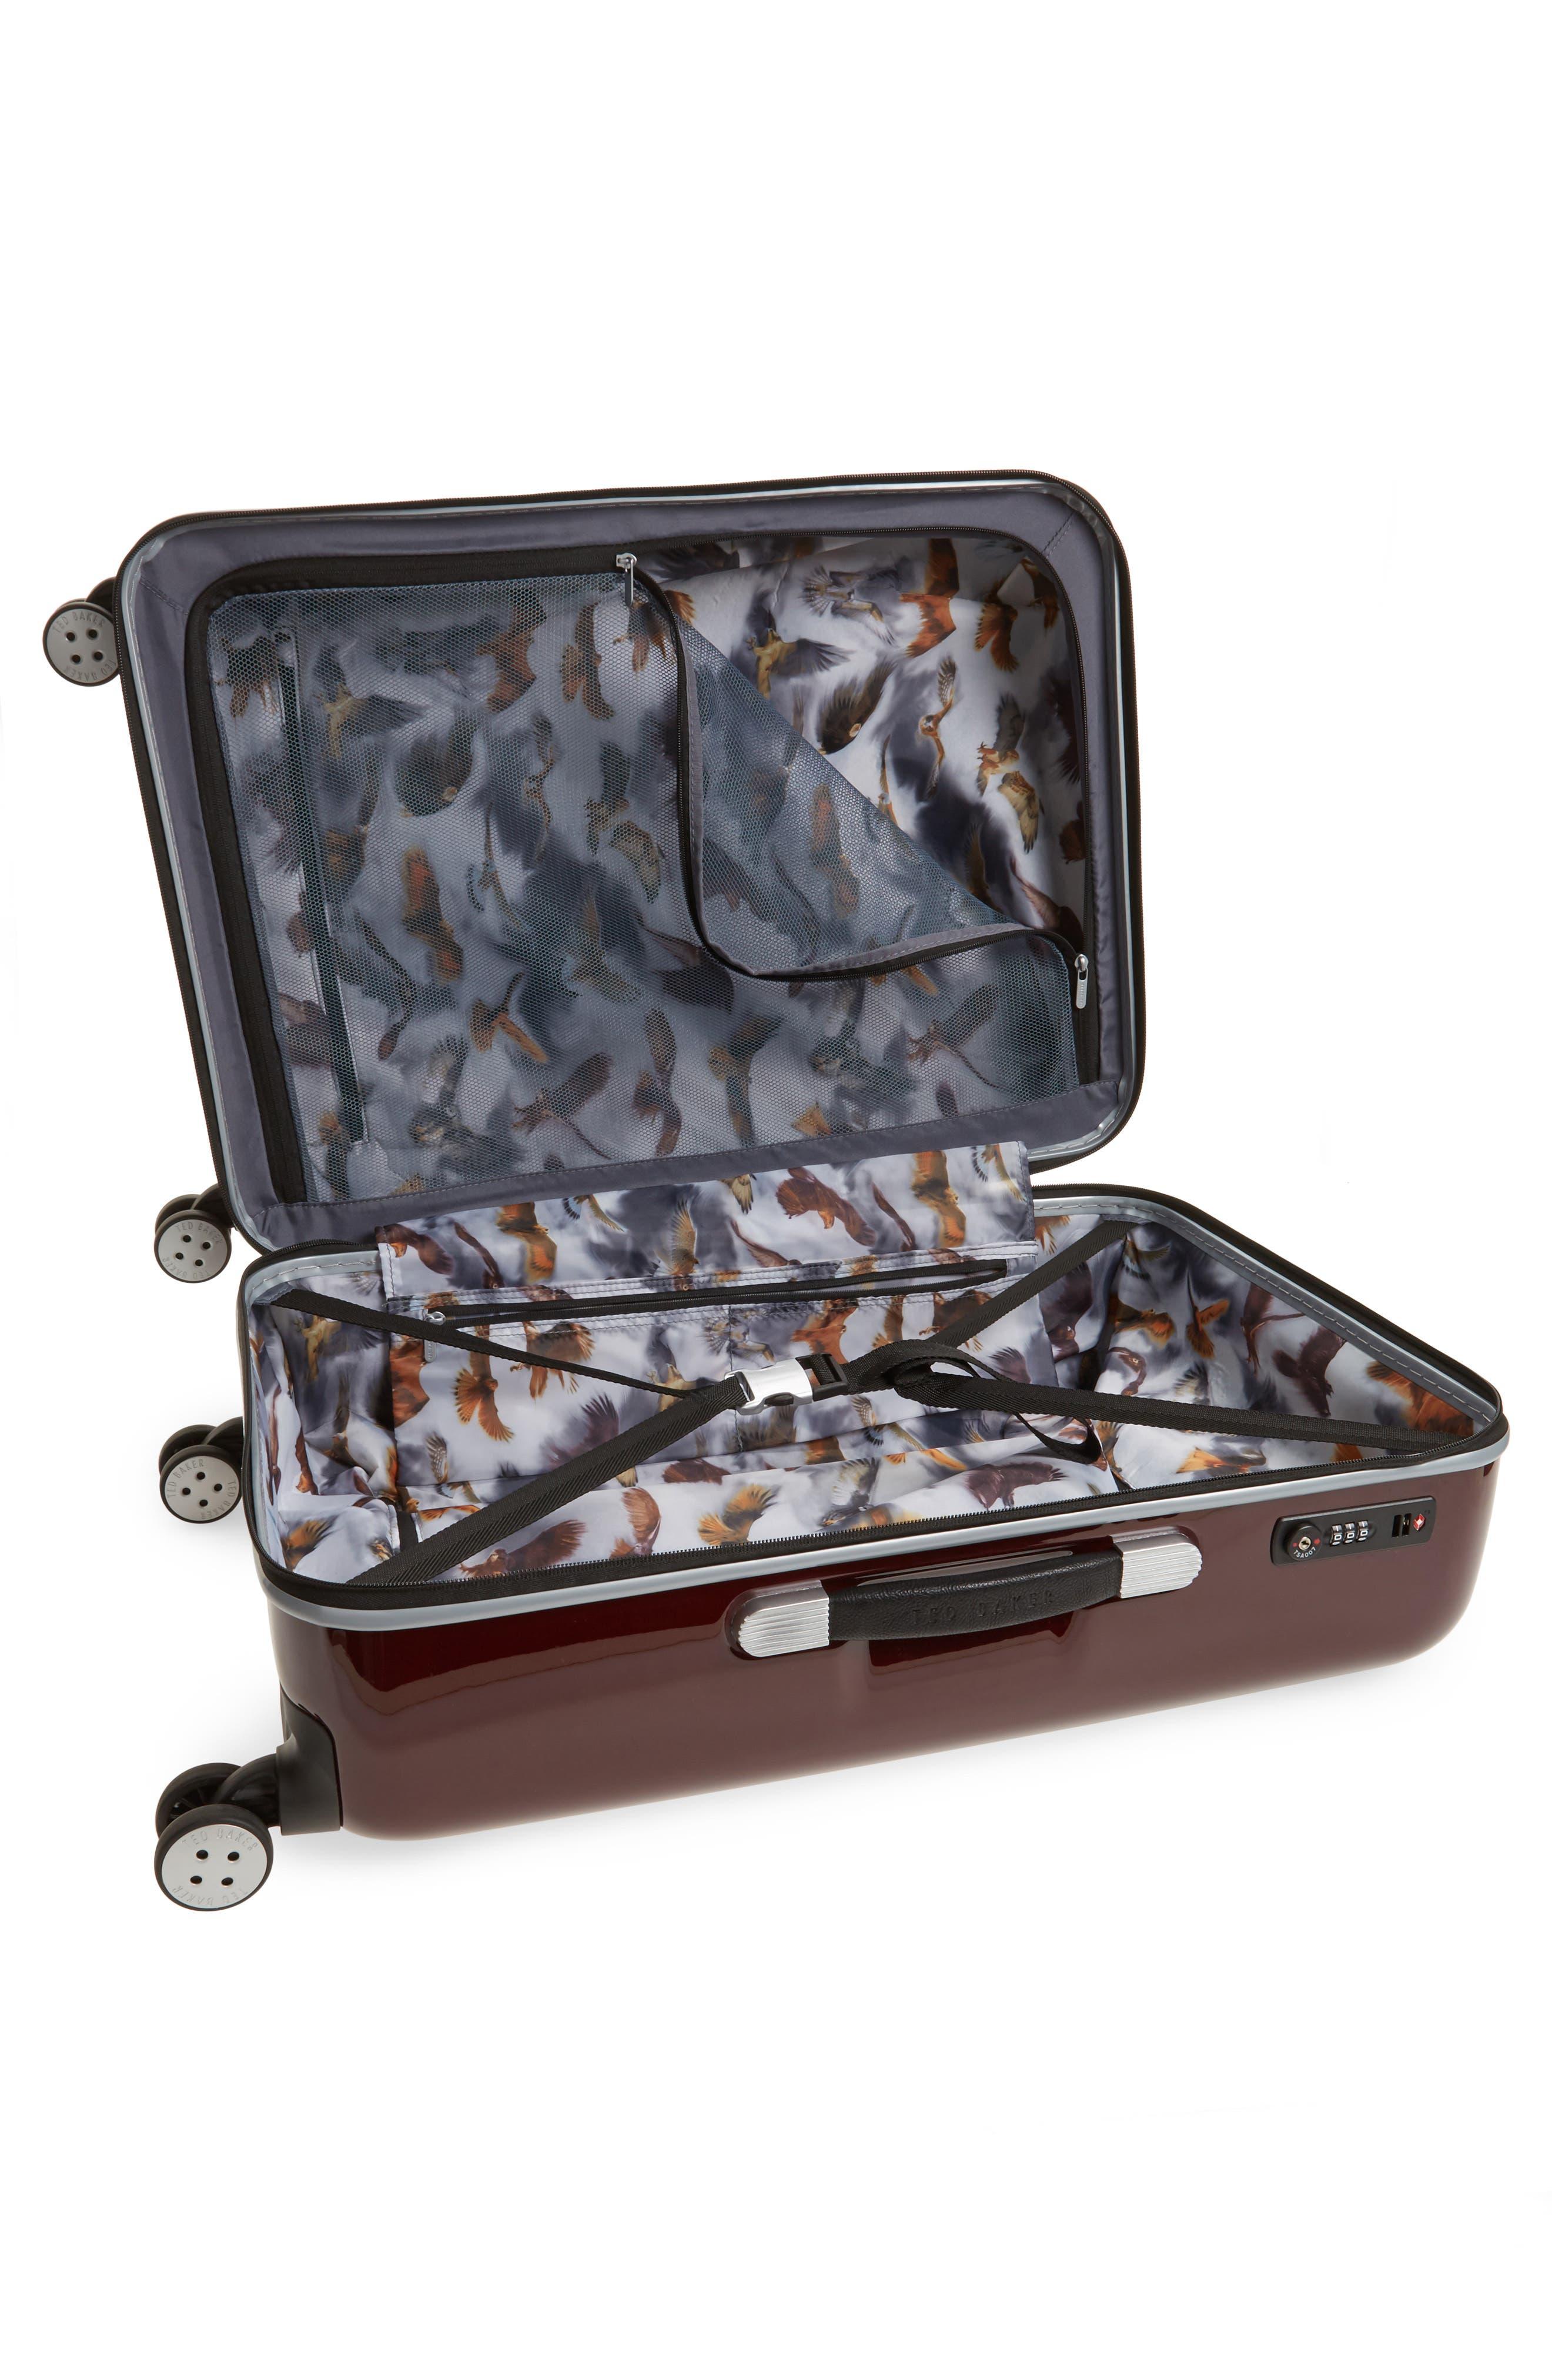 "Medium 28"" Hard Shell Spinner Suitcase,                             Alternate thumbnail 3, color,                             Burg-Graph"